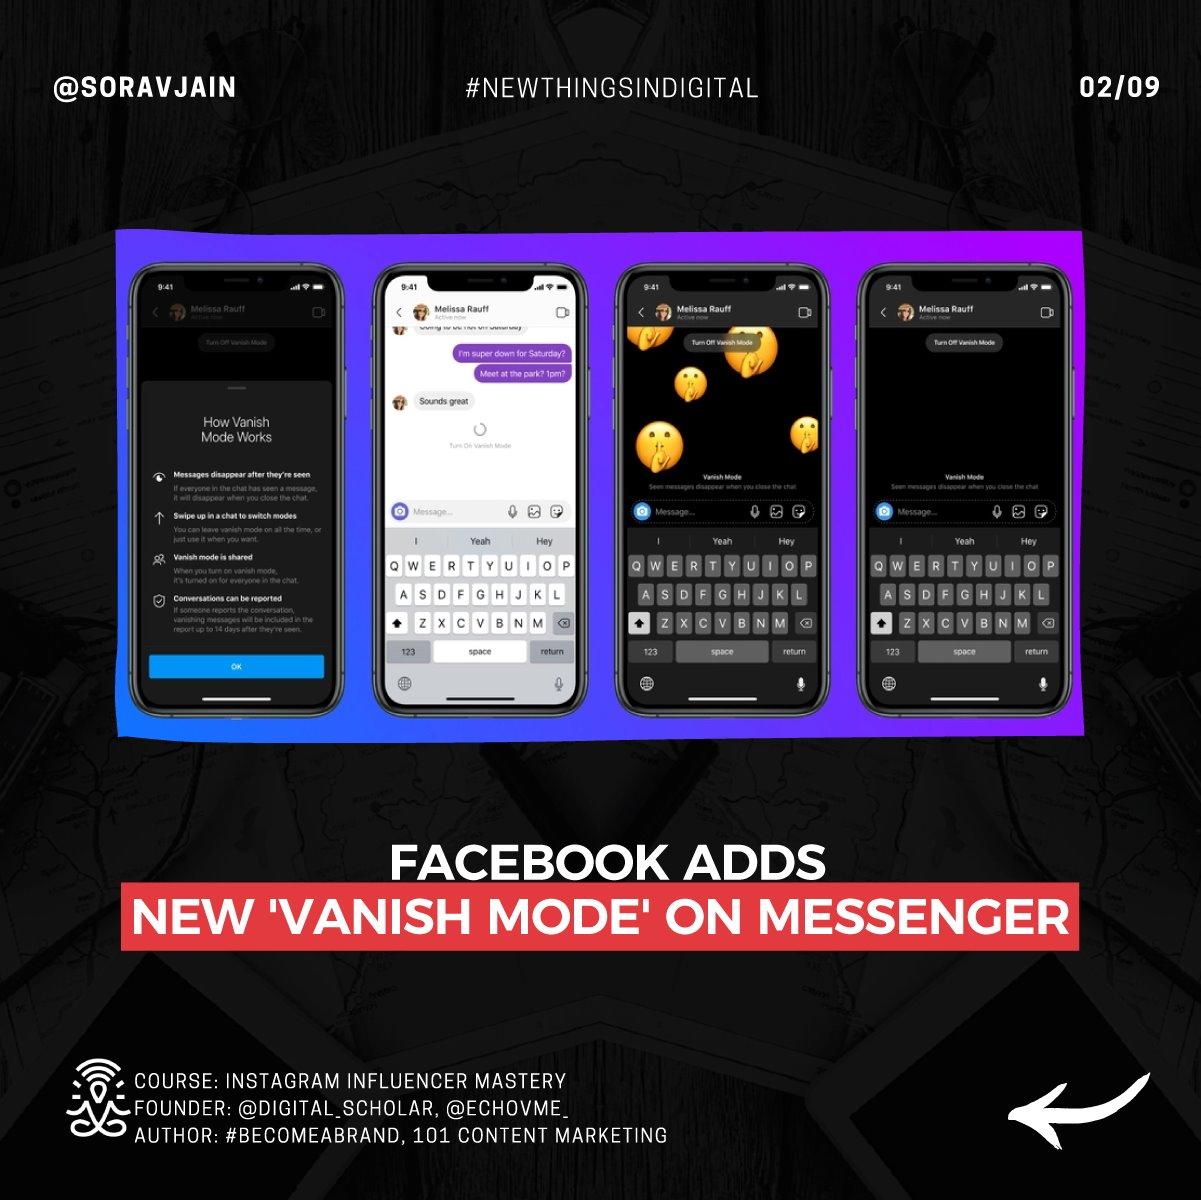 Facebook adds 'Vanish Mode' on Messenger